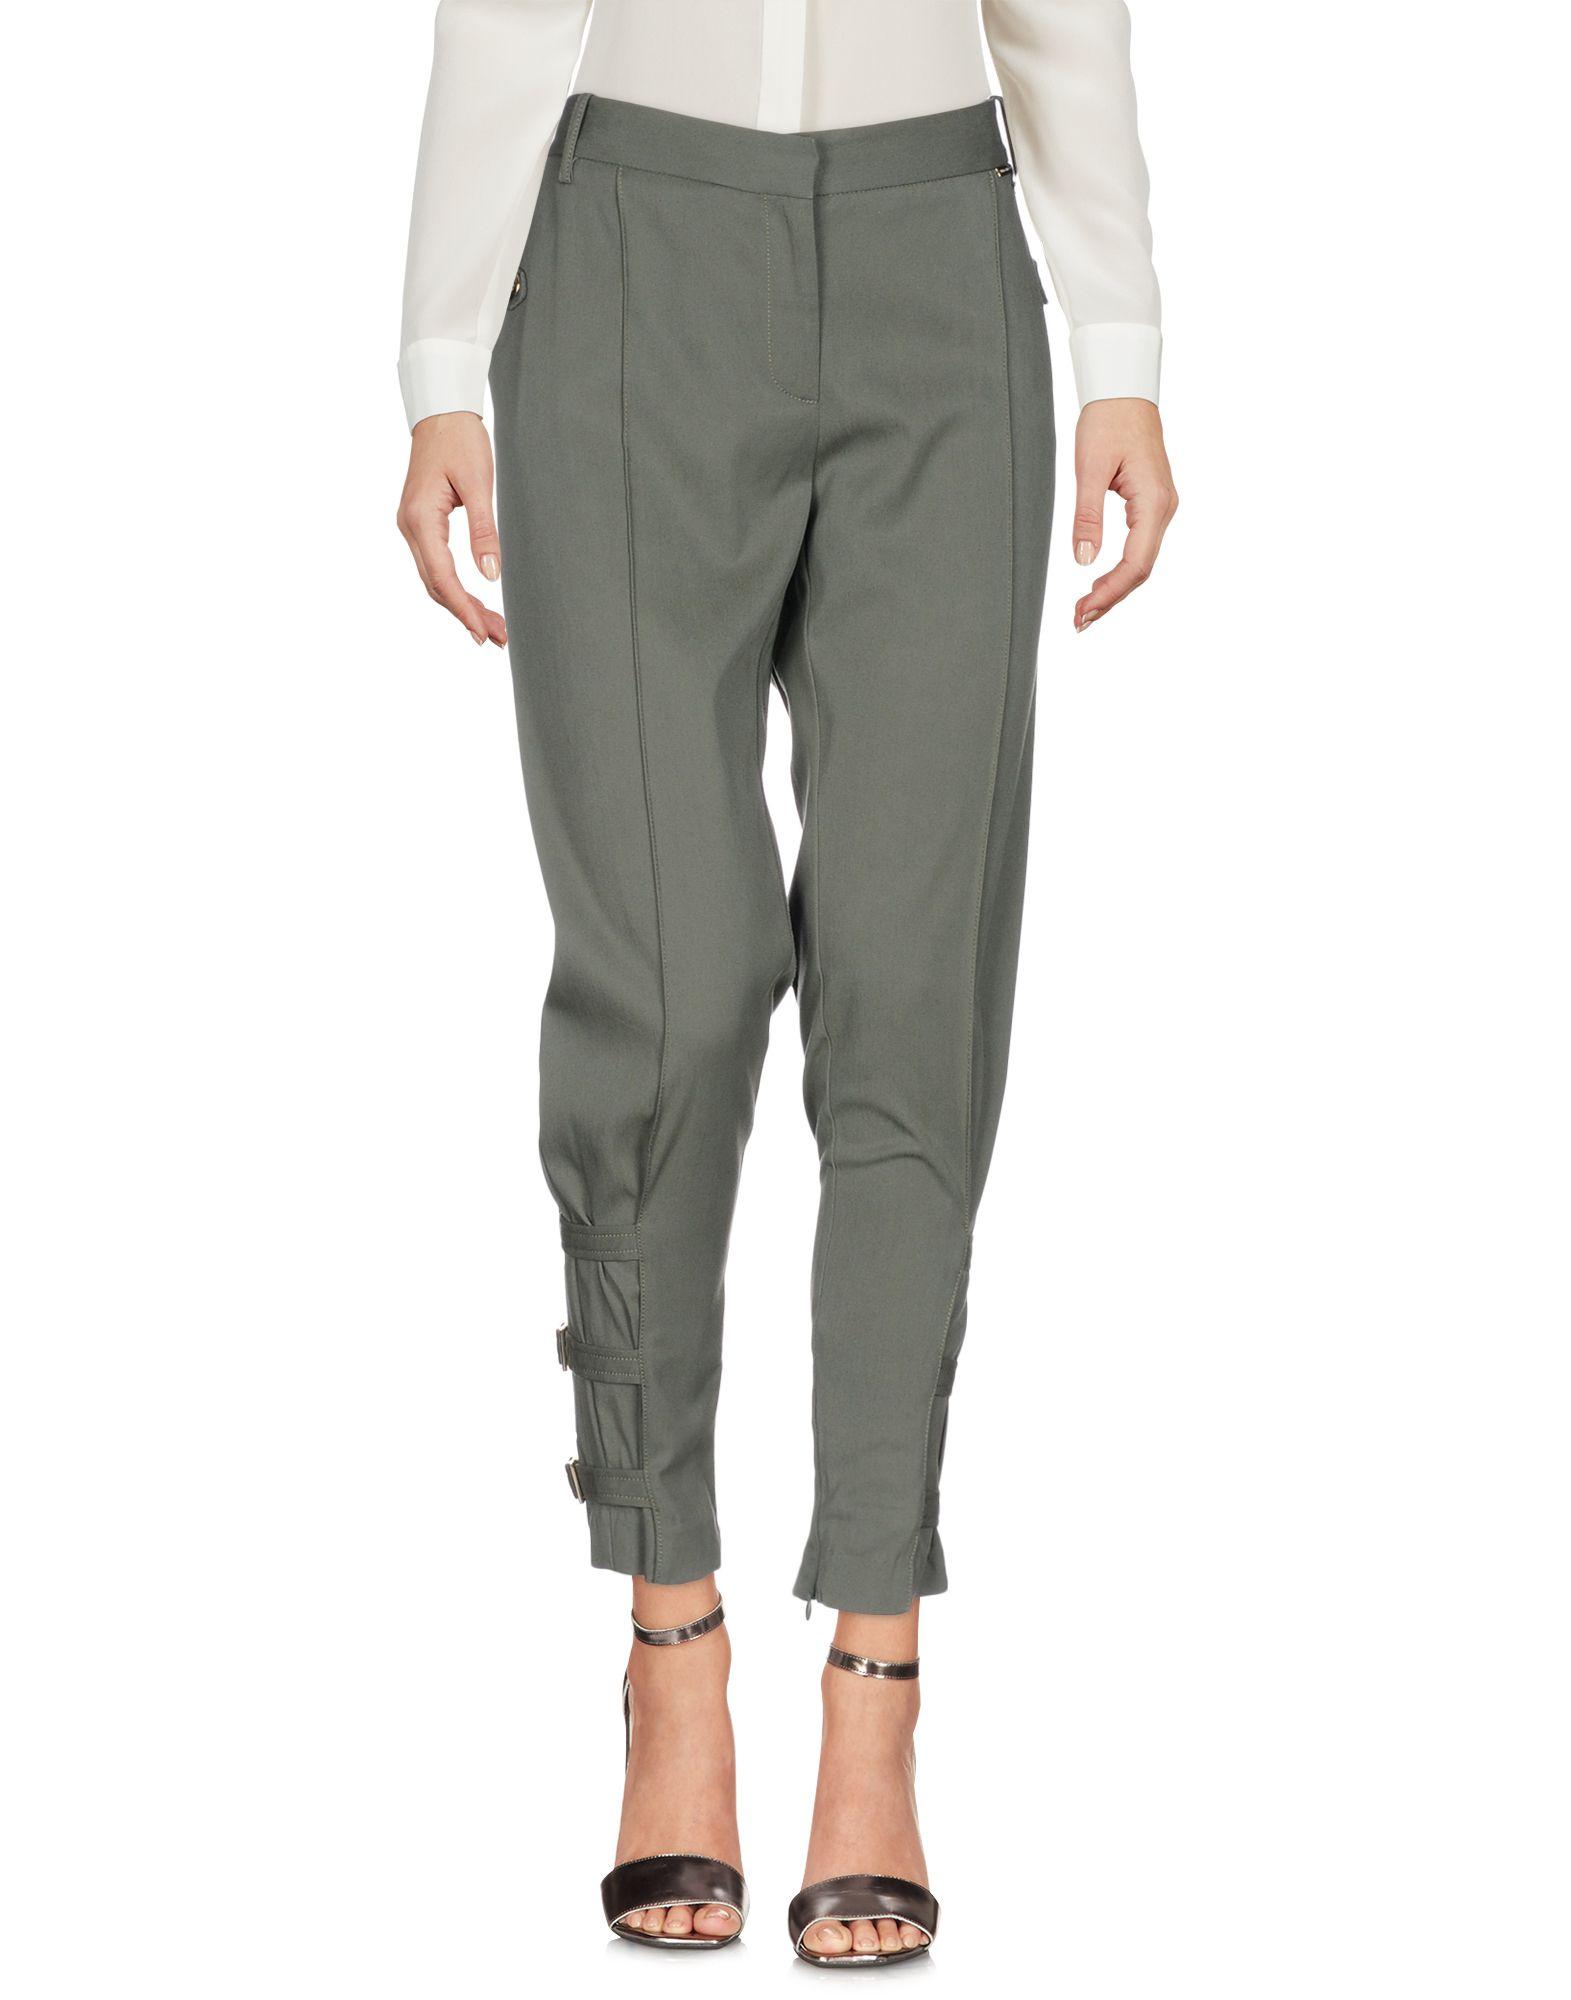 Pantalone Mangano Donna - Acquista online su pNQdC92jK